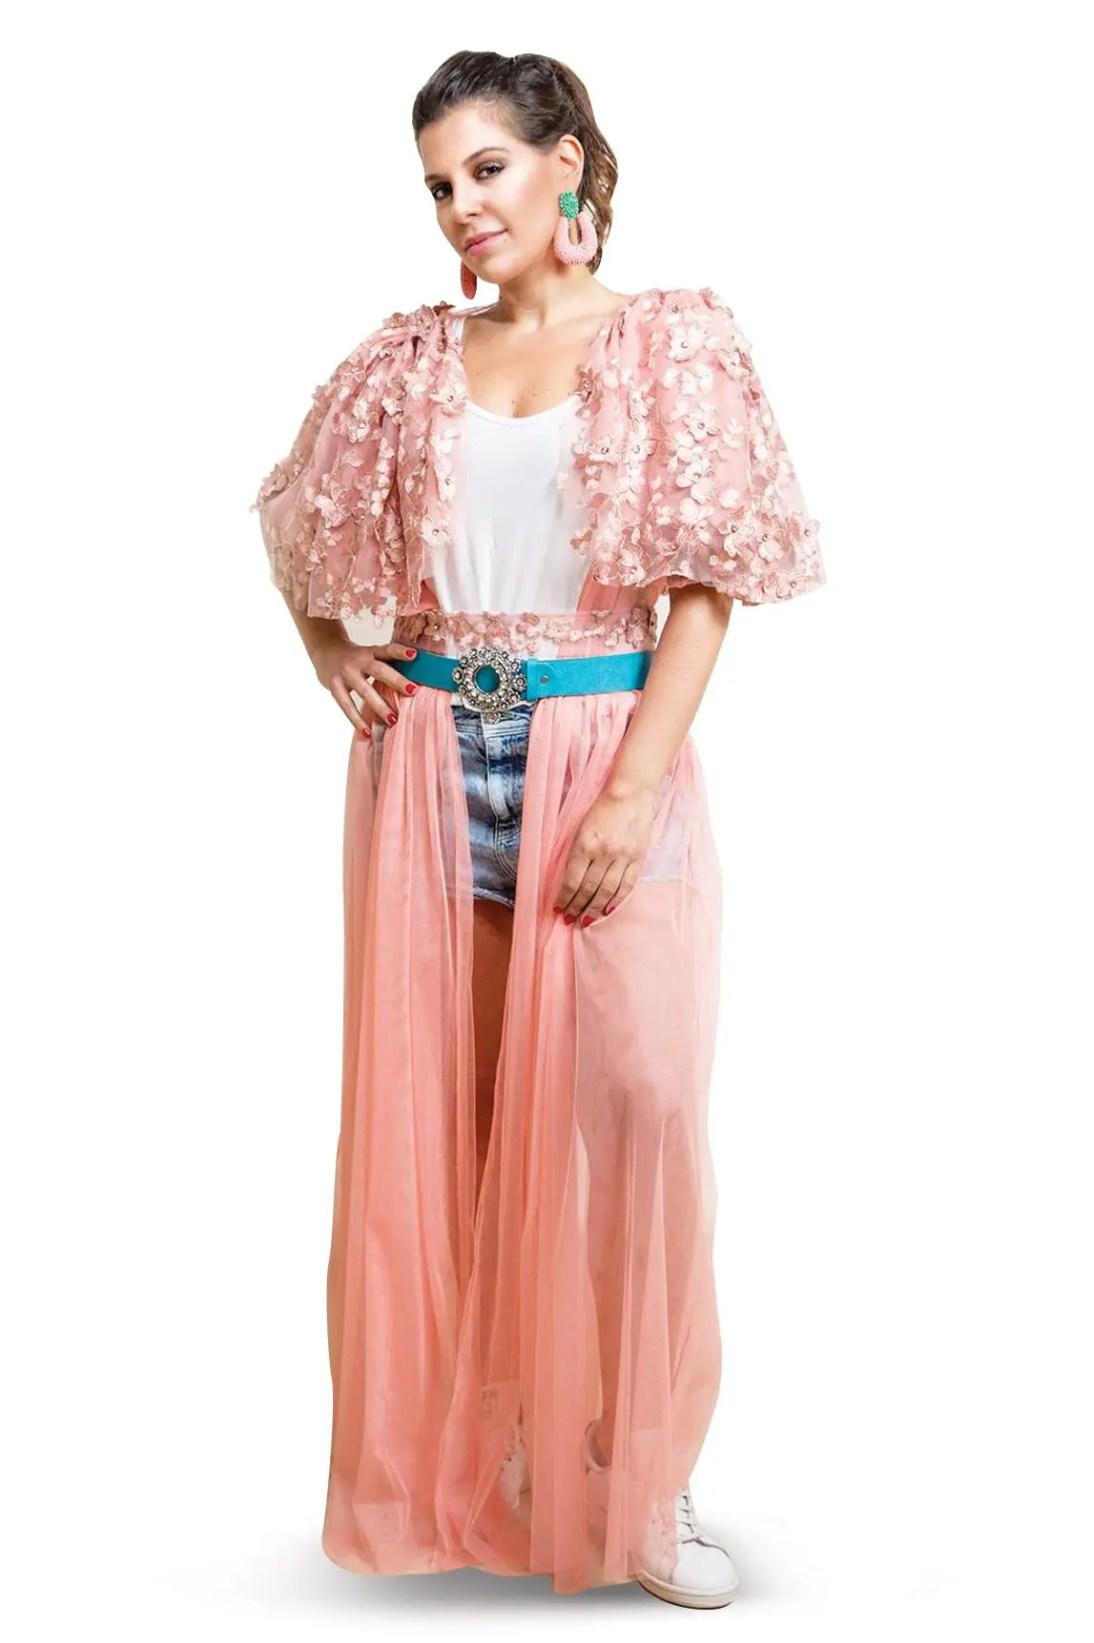 8629c0c00ba83 عباية الأحلام الوردية (The Rosy Dream Abaya) – متجر خود للأزياء ...